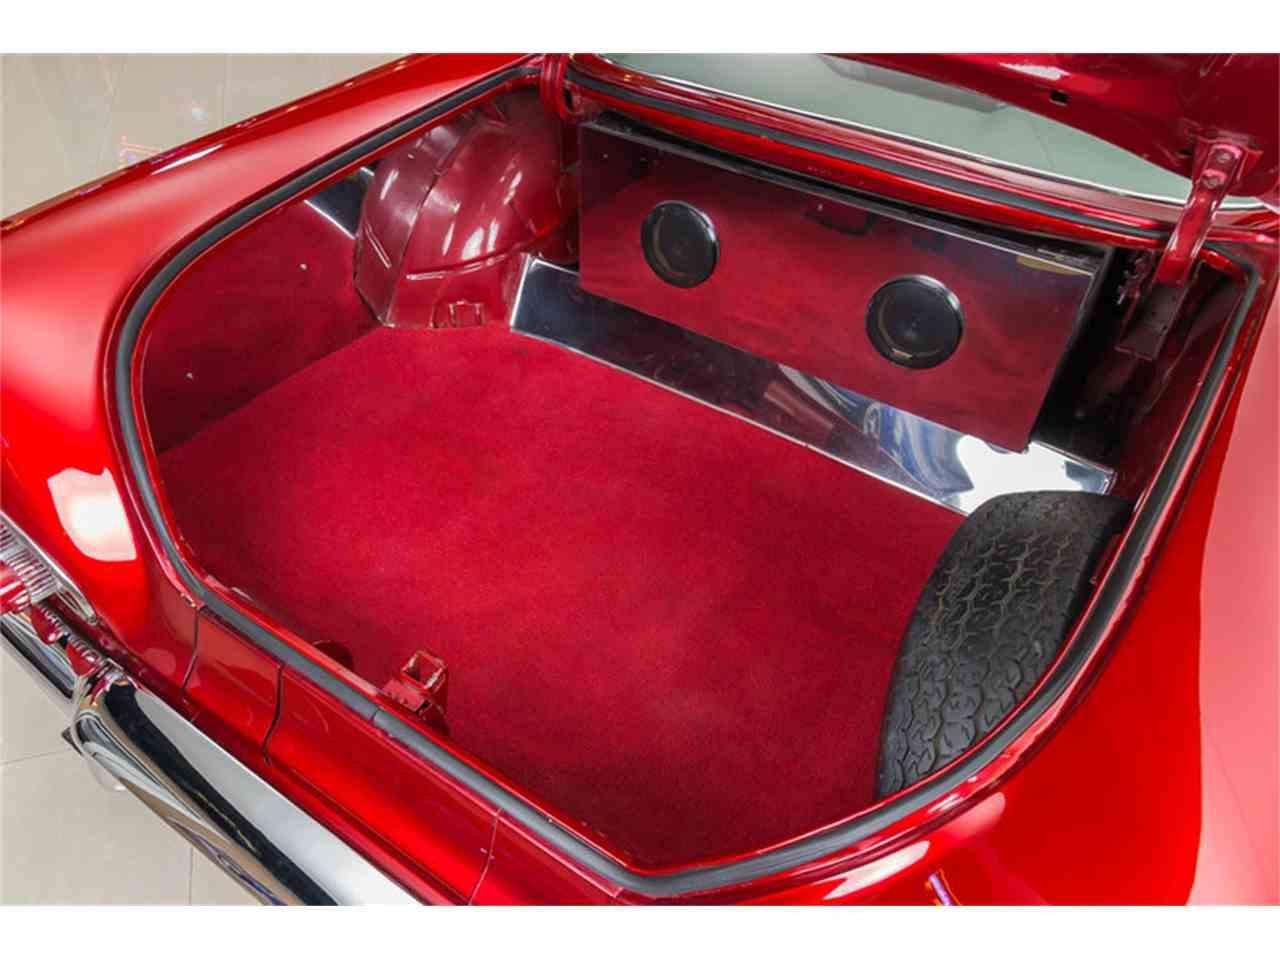 Large Picture of '58 Impala - $64,900.00 - K273